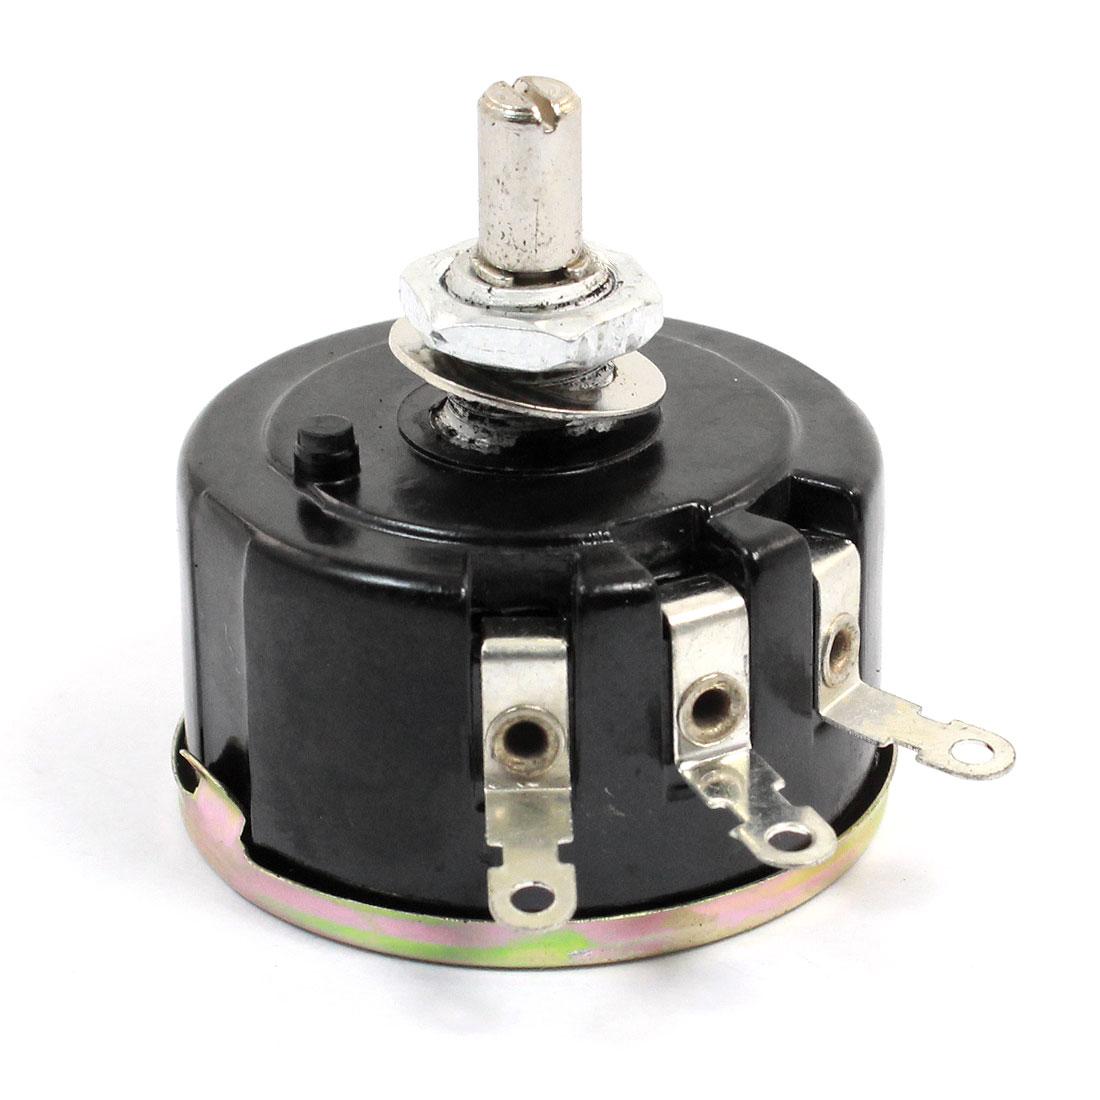 Full Size 100 Ohm 5W 5Watt Wire Wound Potentiometer Pot 42mm Body Diameter